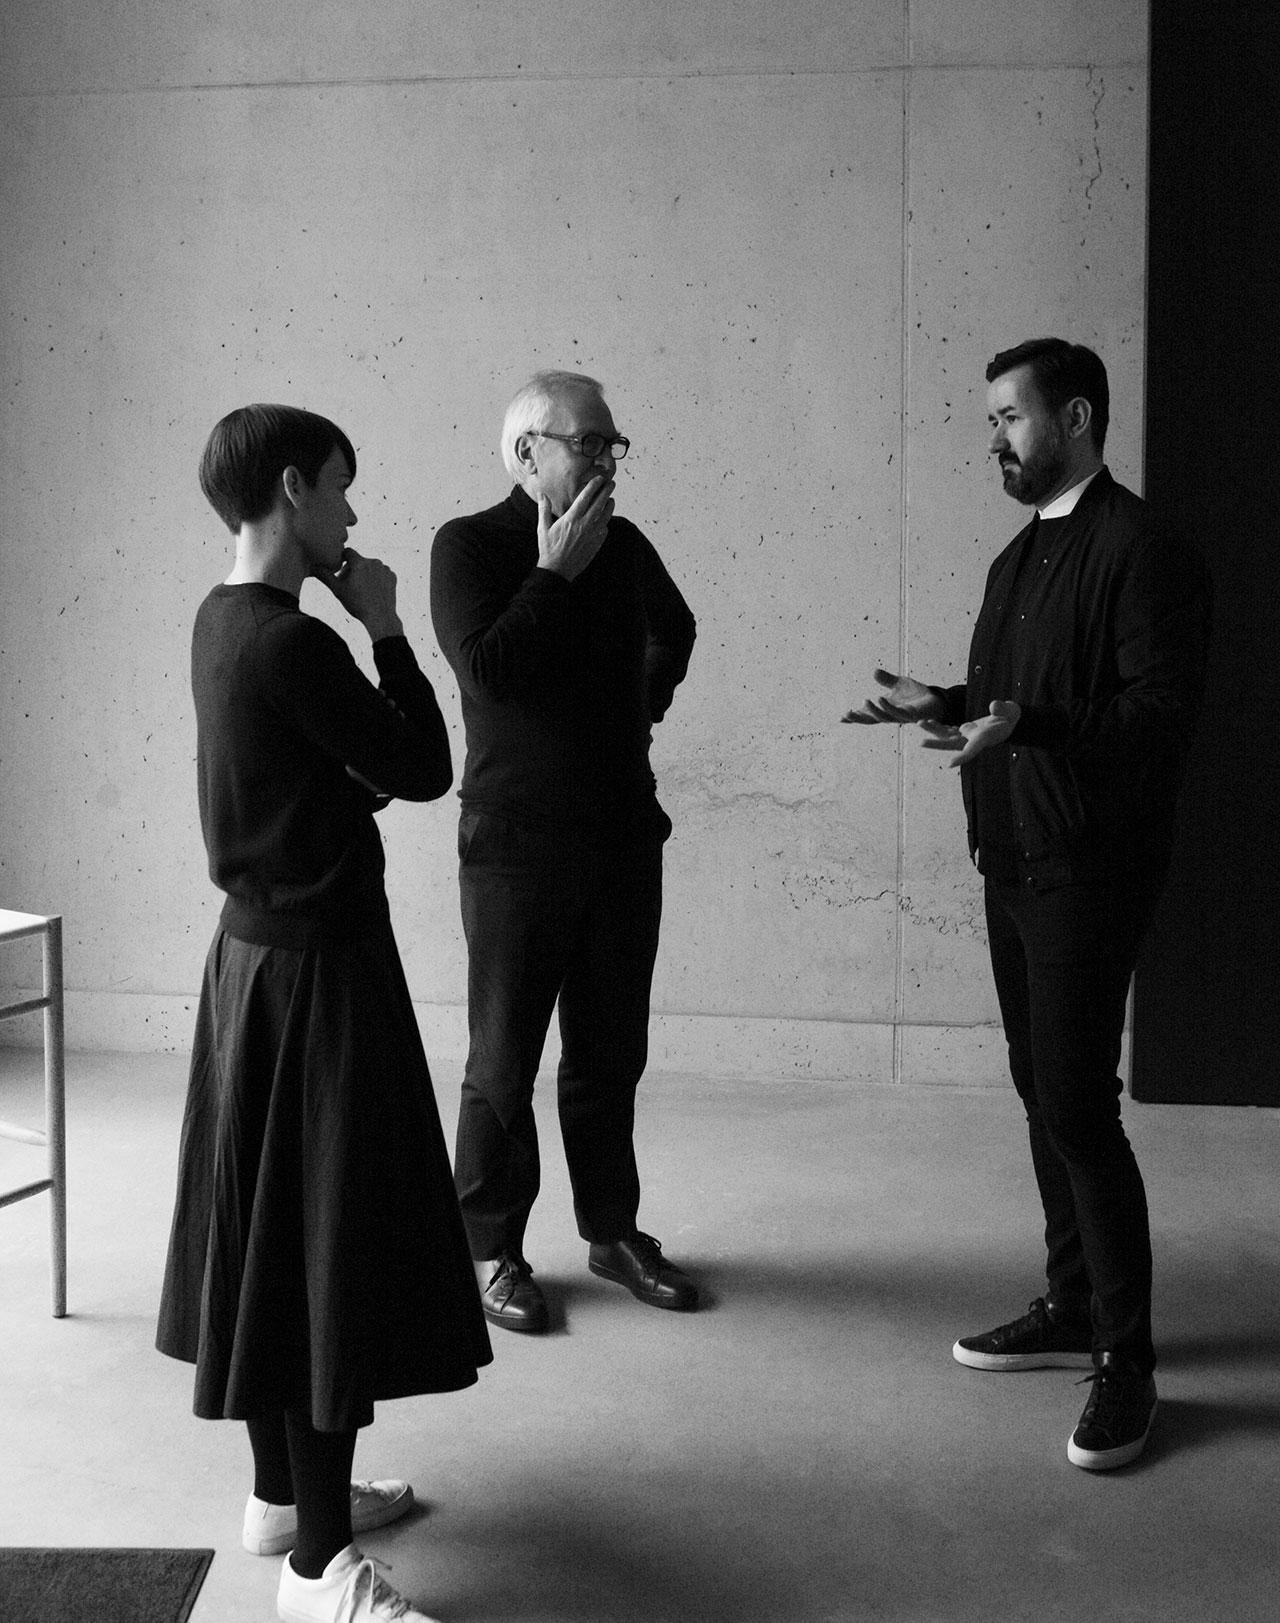 Esther Schulze-Tsatsas,Sir David Chipperfield and Dimitrios Tsatsas. Photo © Alexander Kilian, Berlin